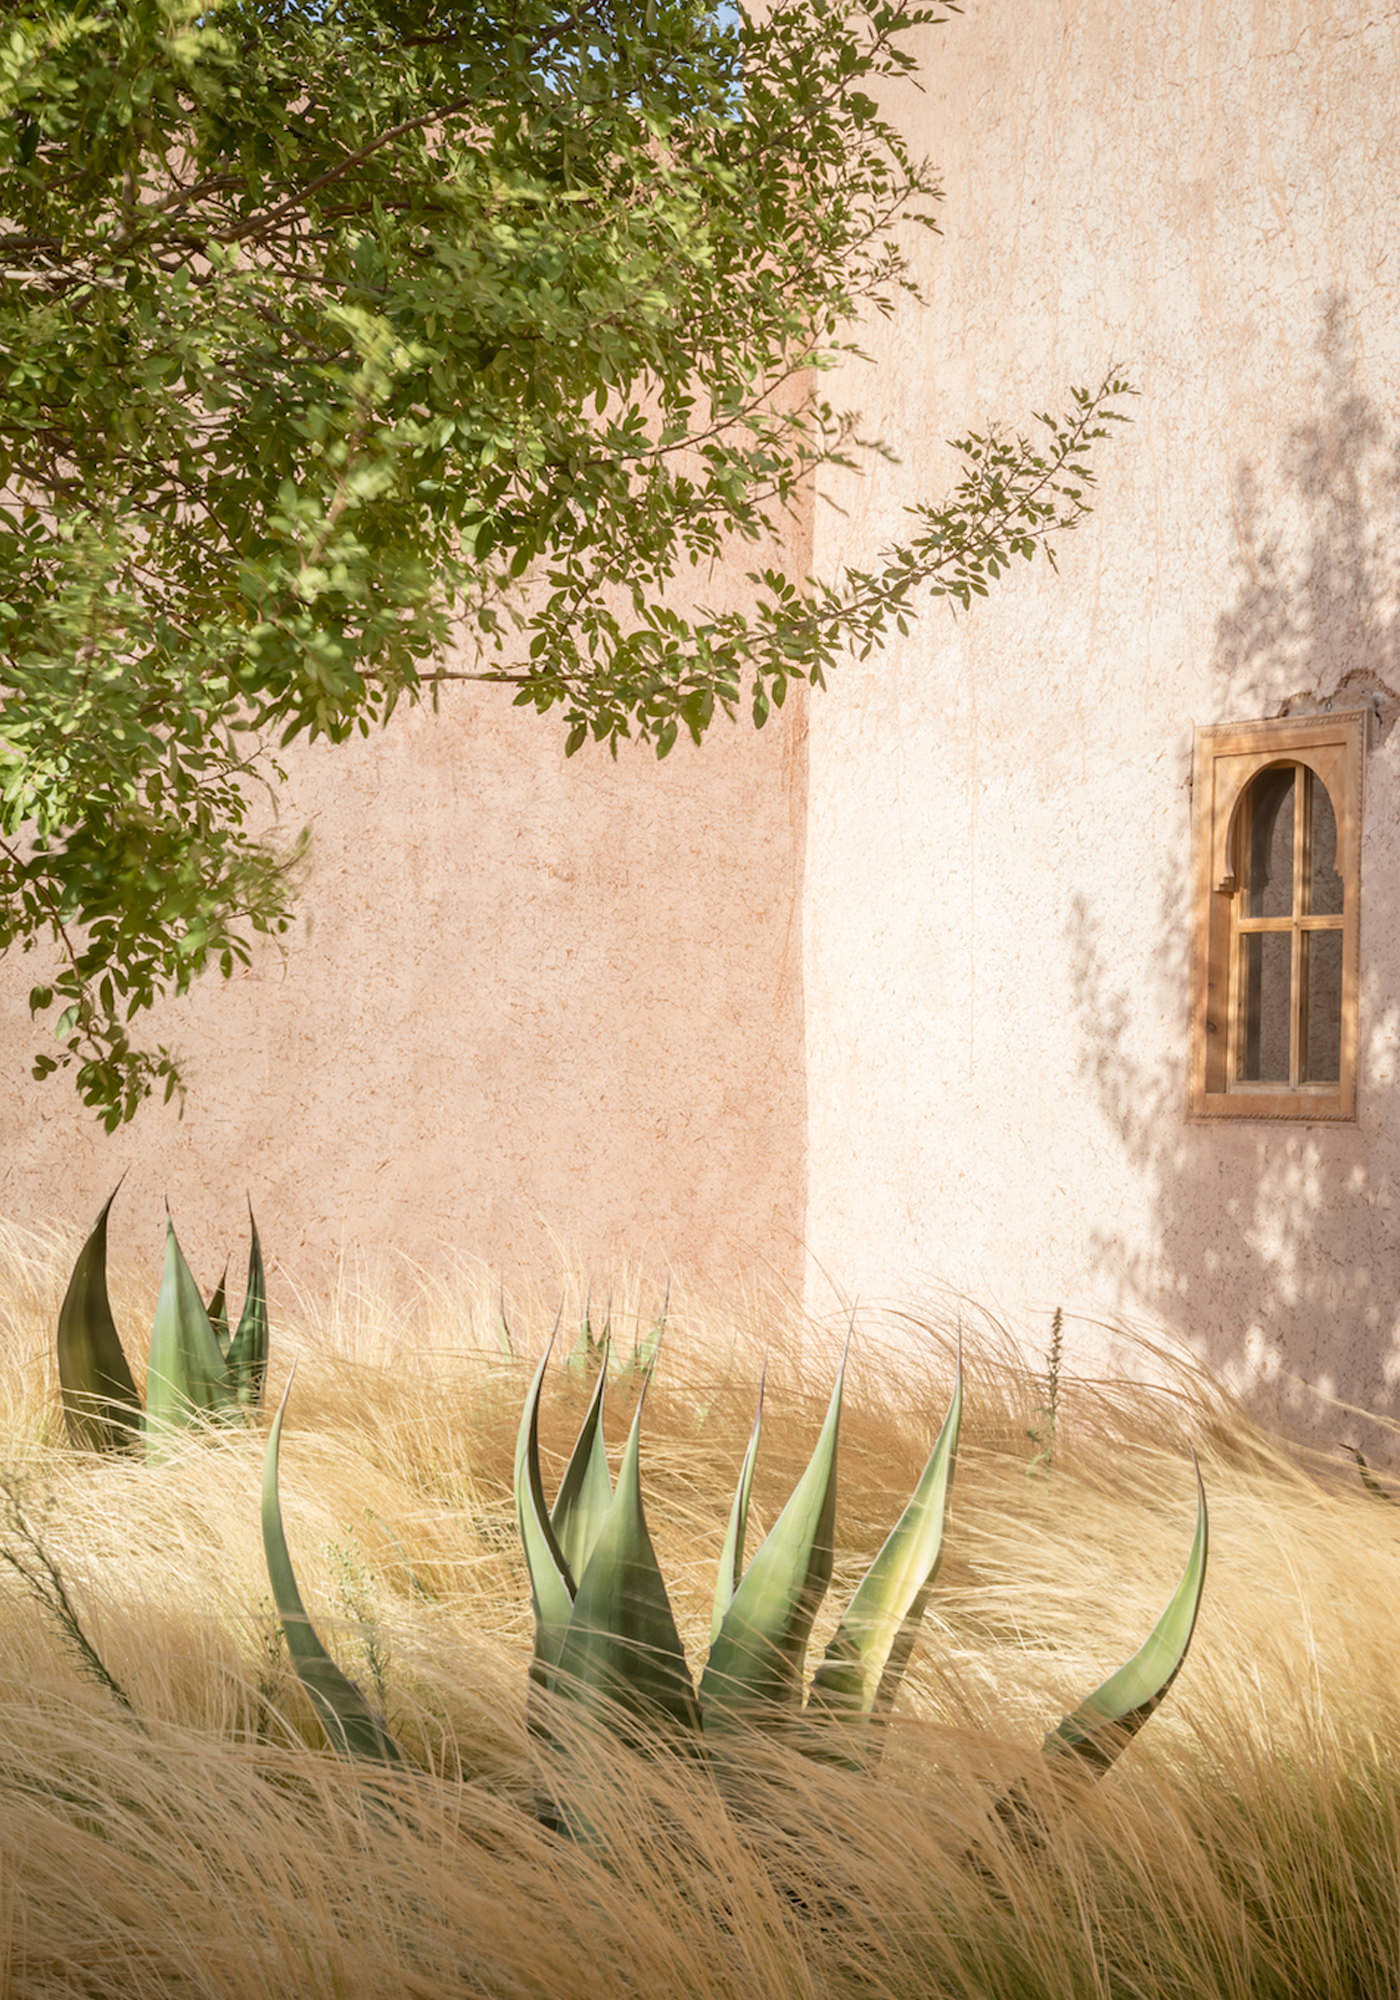 Berber Lodge Hotel Maison Oumnas Maroc Marrakech Details